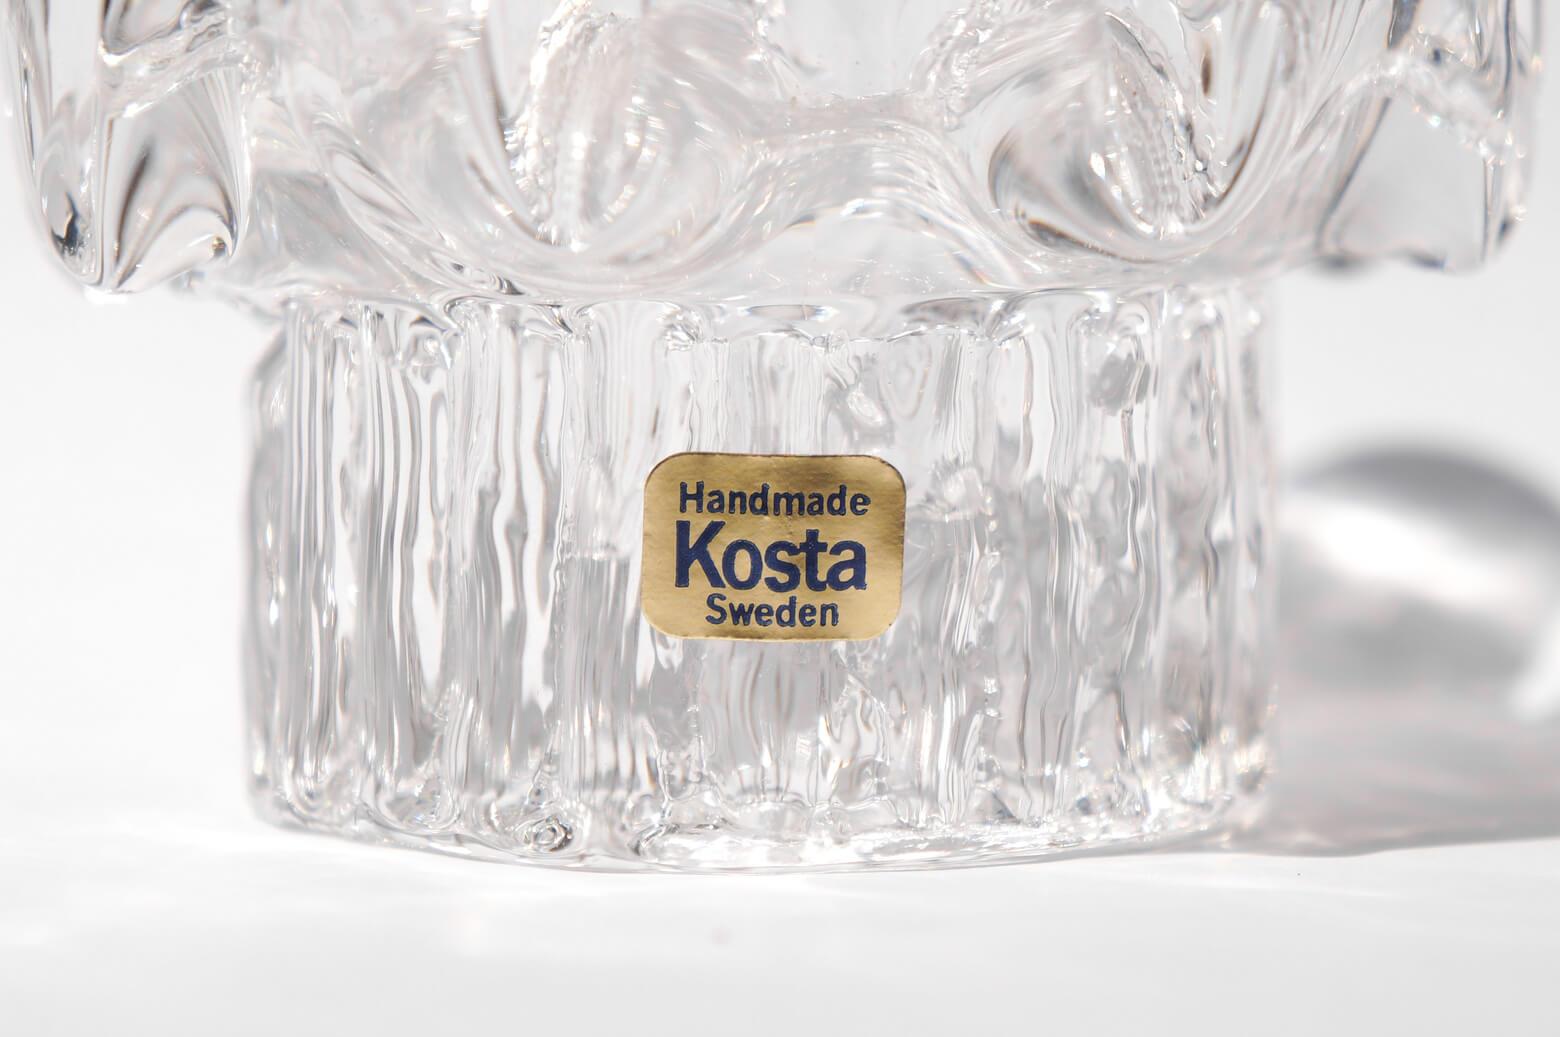 Kosta Sunflower Candle Holder Goran Warff/コスタ キャンドルホルダー サンフラワー ヨーラン・ヴァルフ ガラス 北欧雑貨